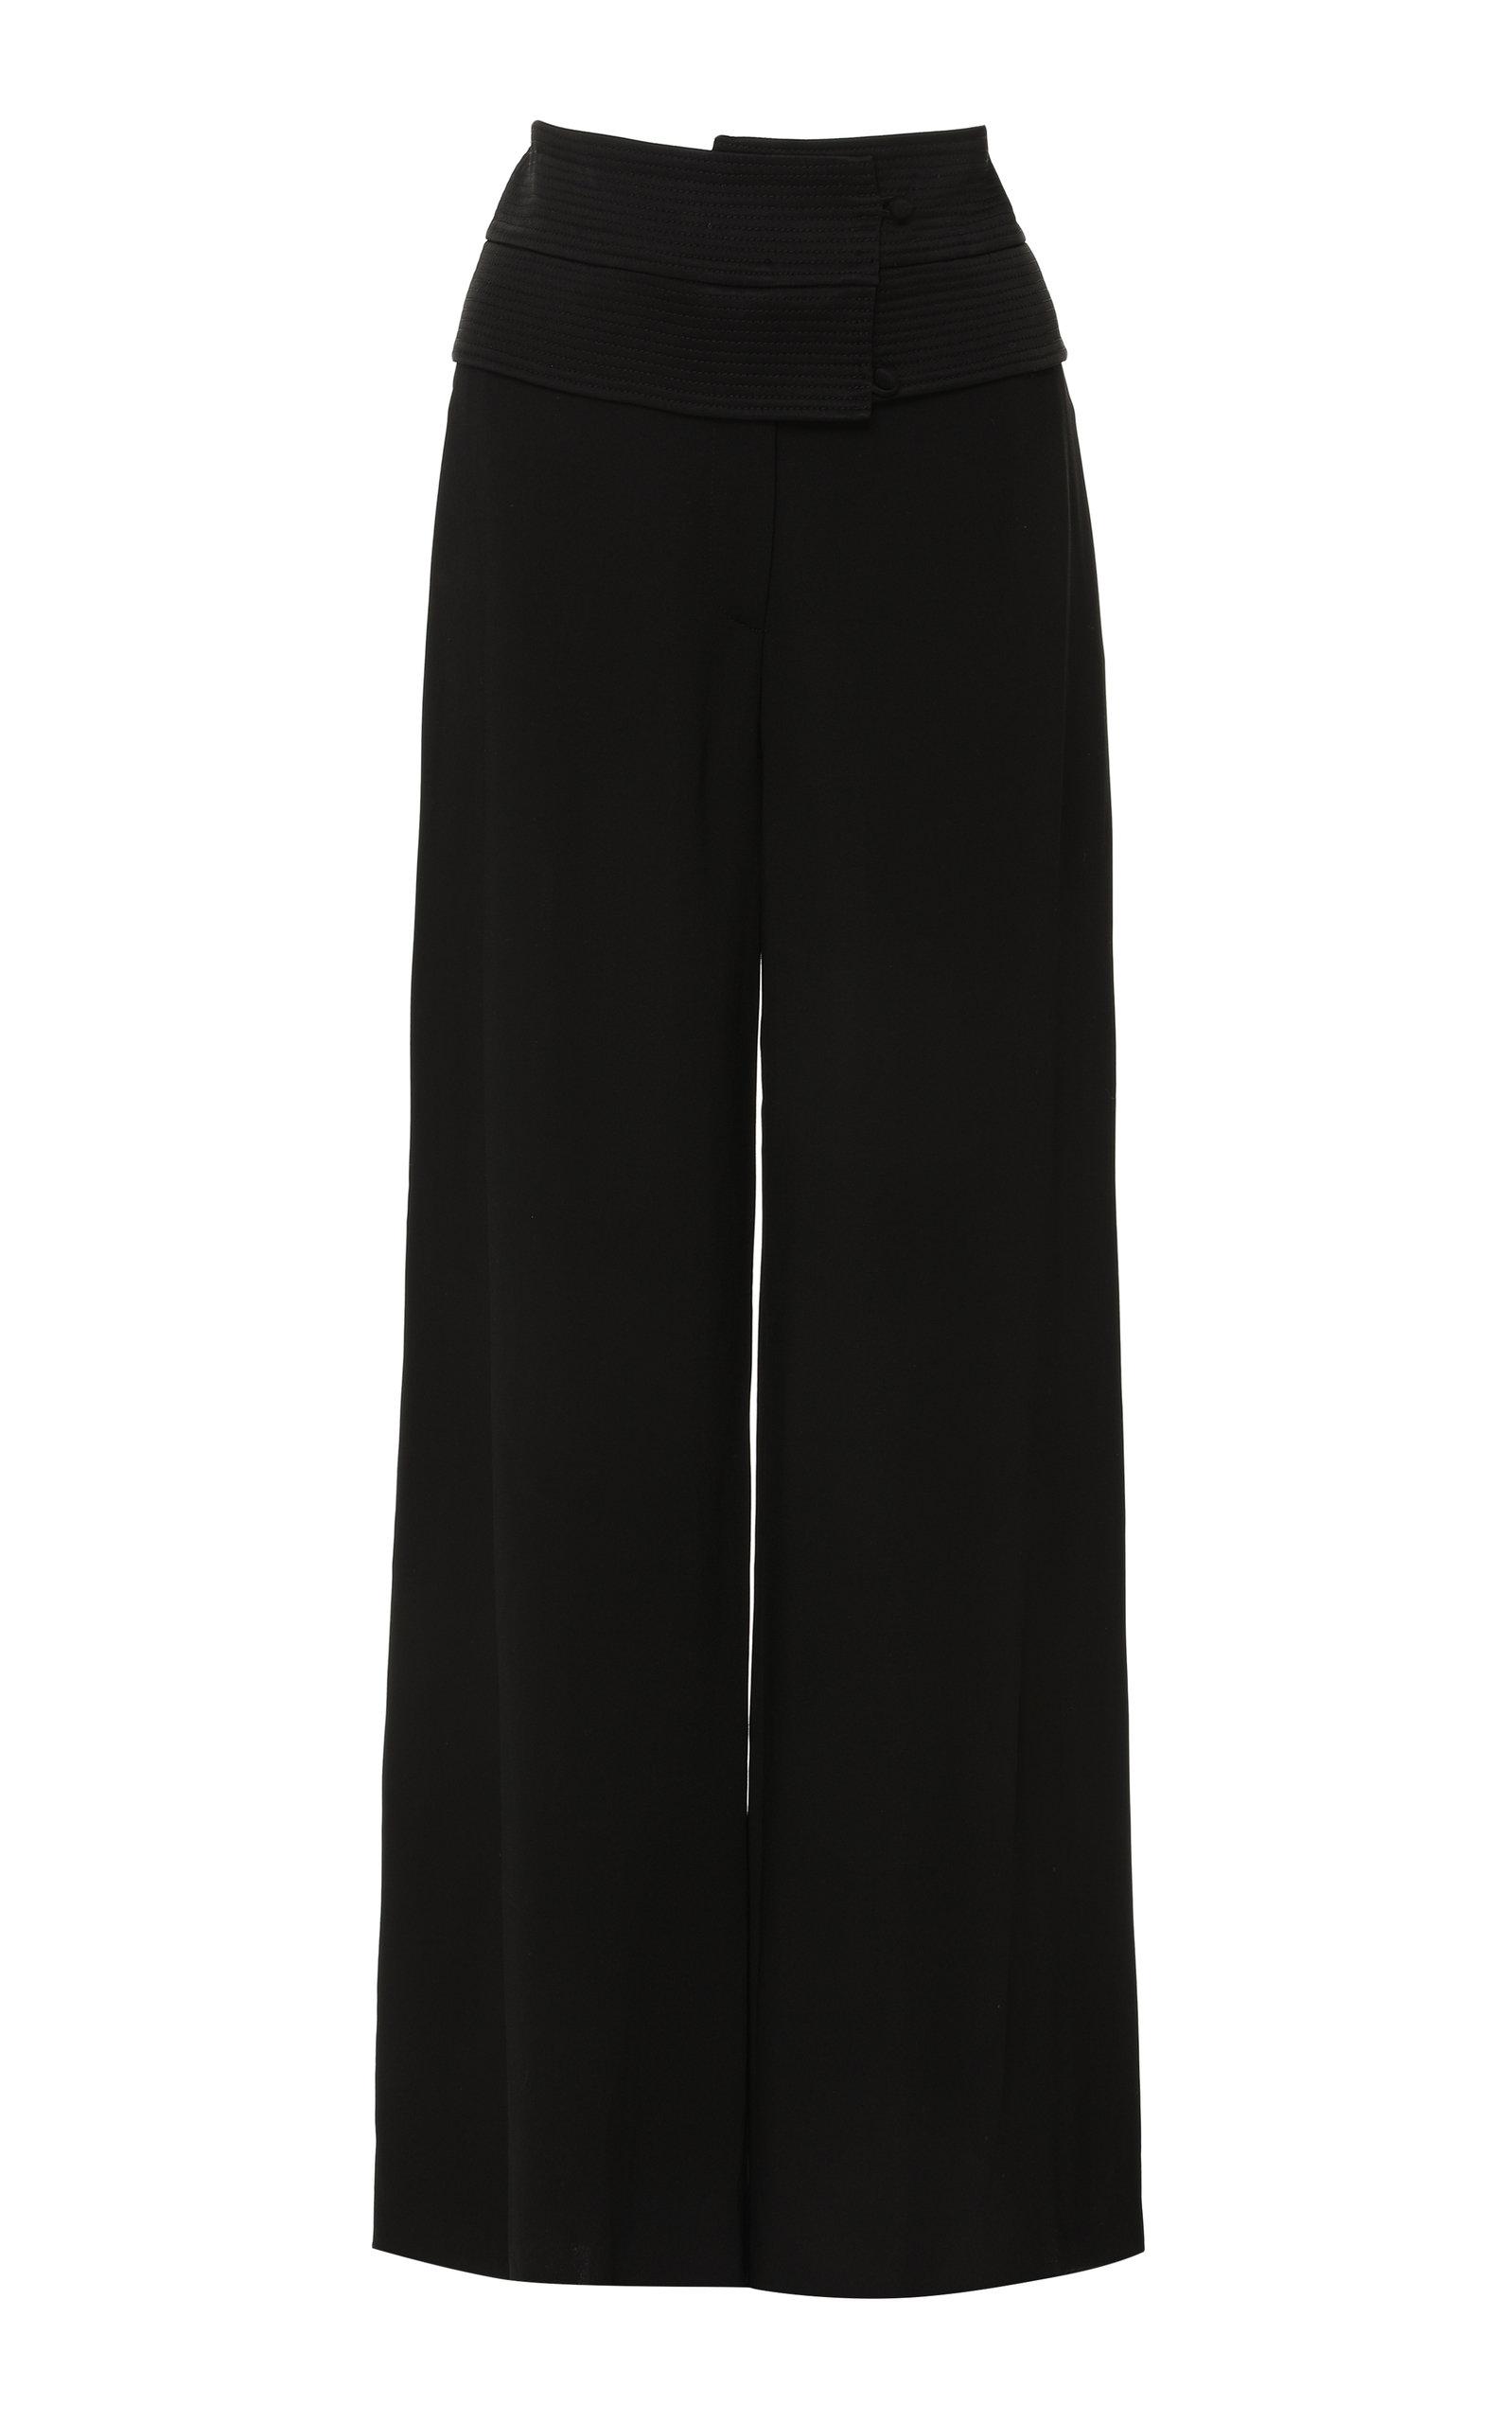 ARJE Obi Stretch Viscose Pants in Black